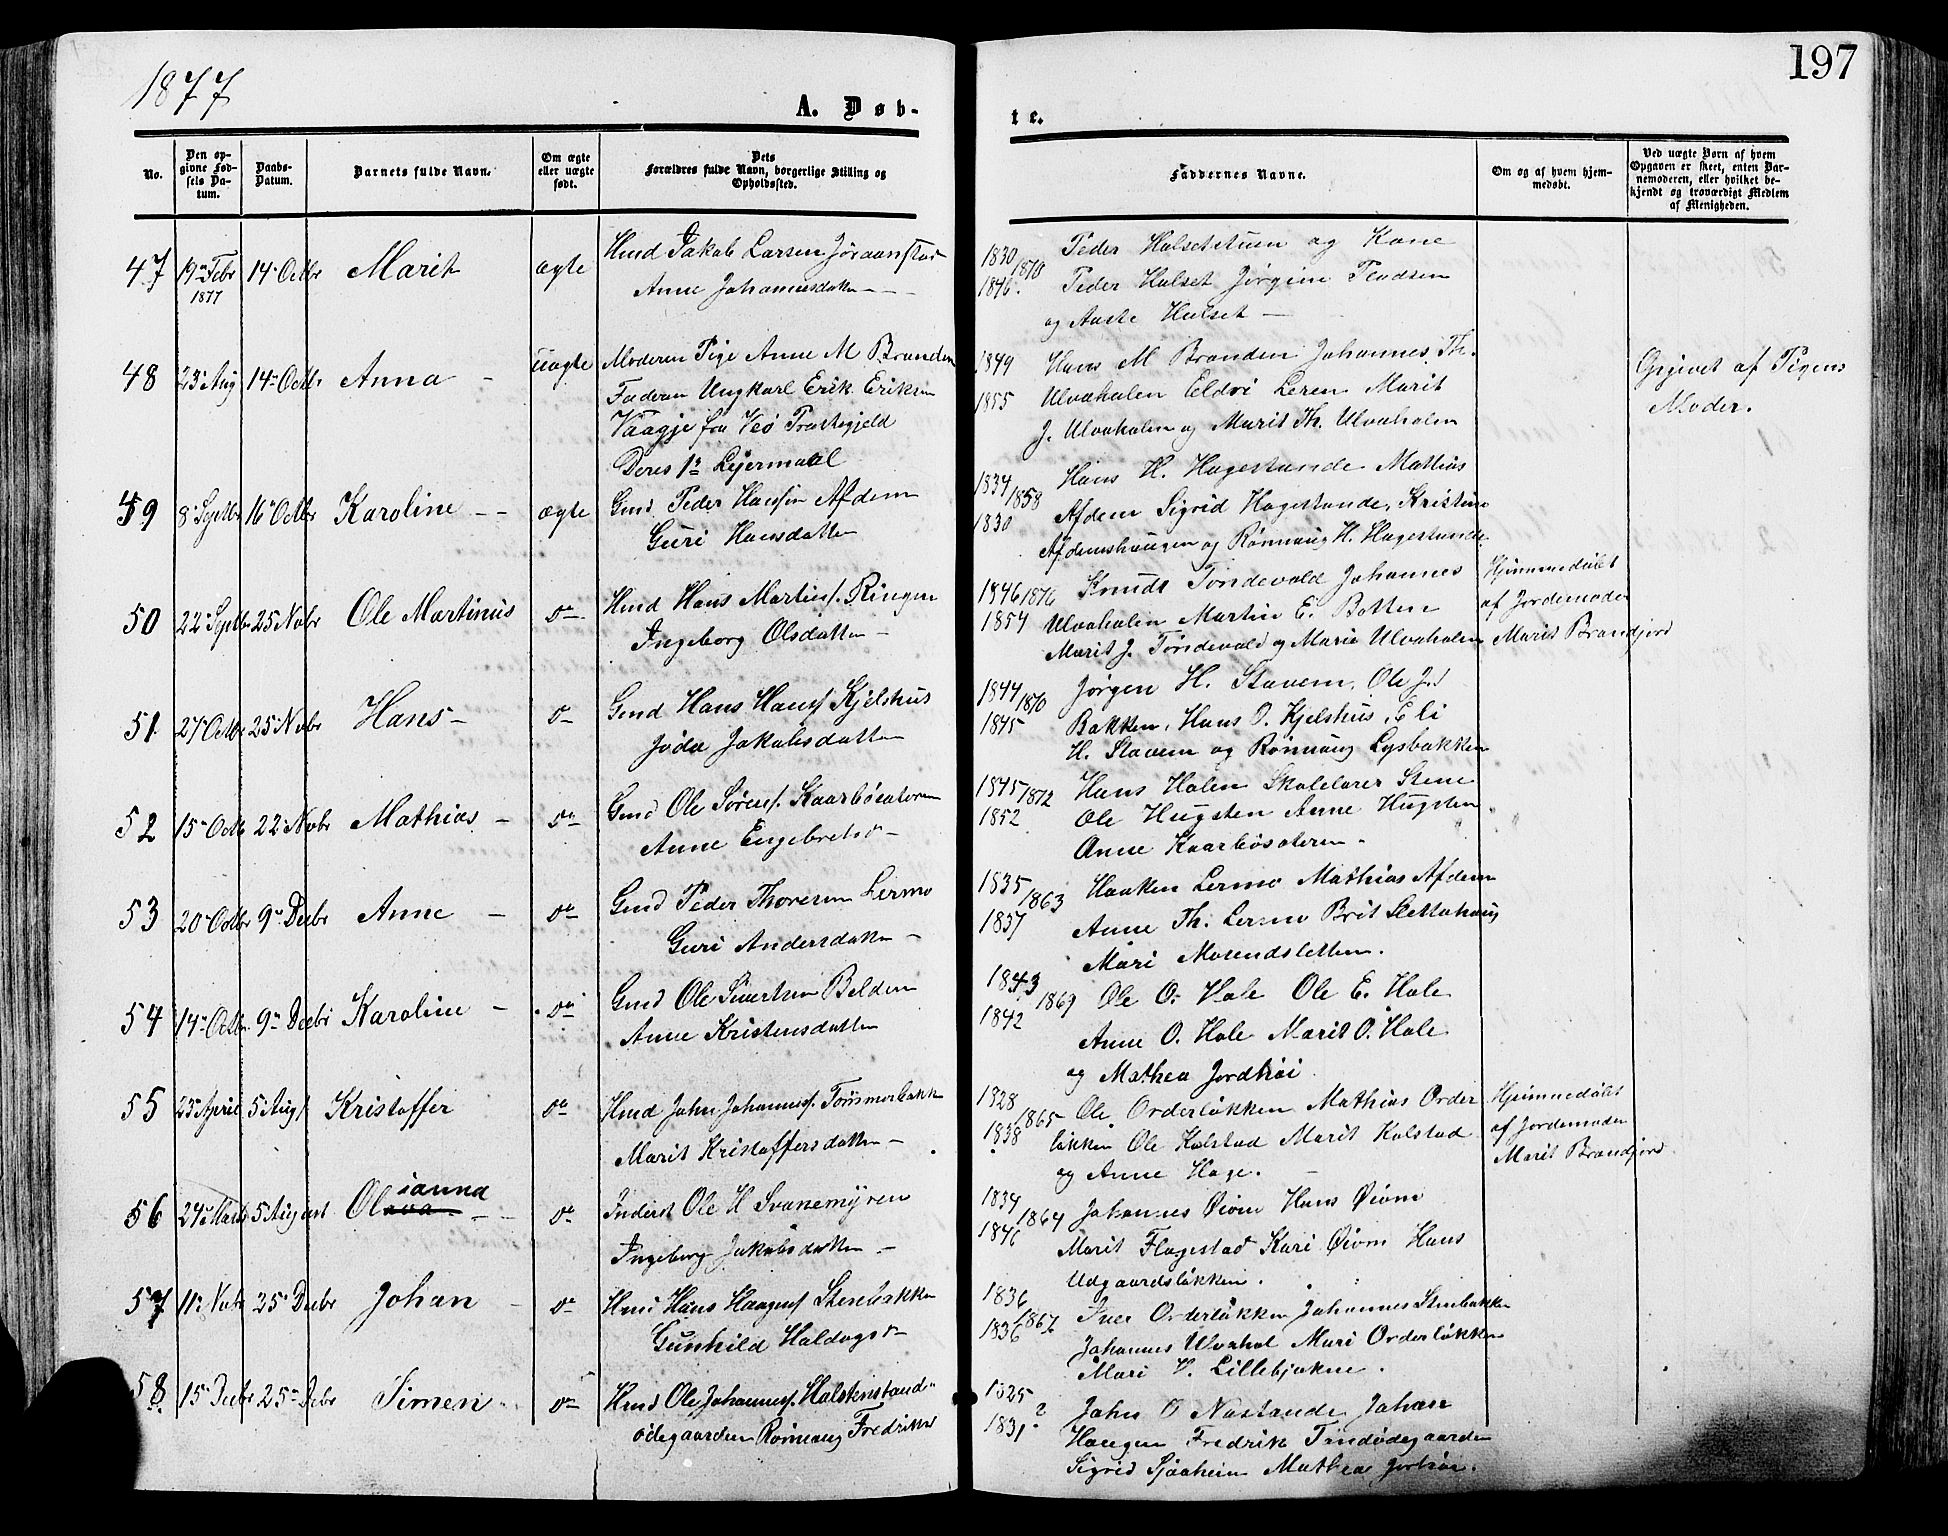 SAH, Lesja prestekontor, Ministerialbok nr. 8, 1854-1880, s. 197